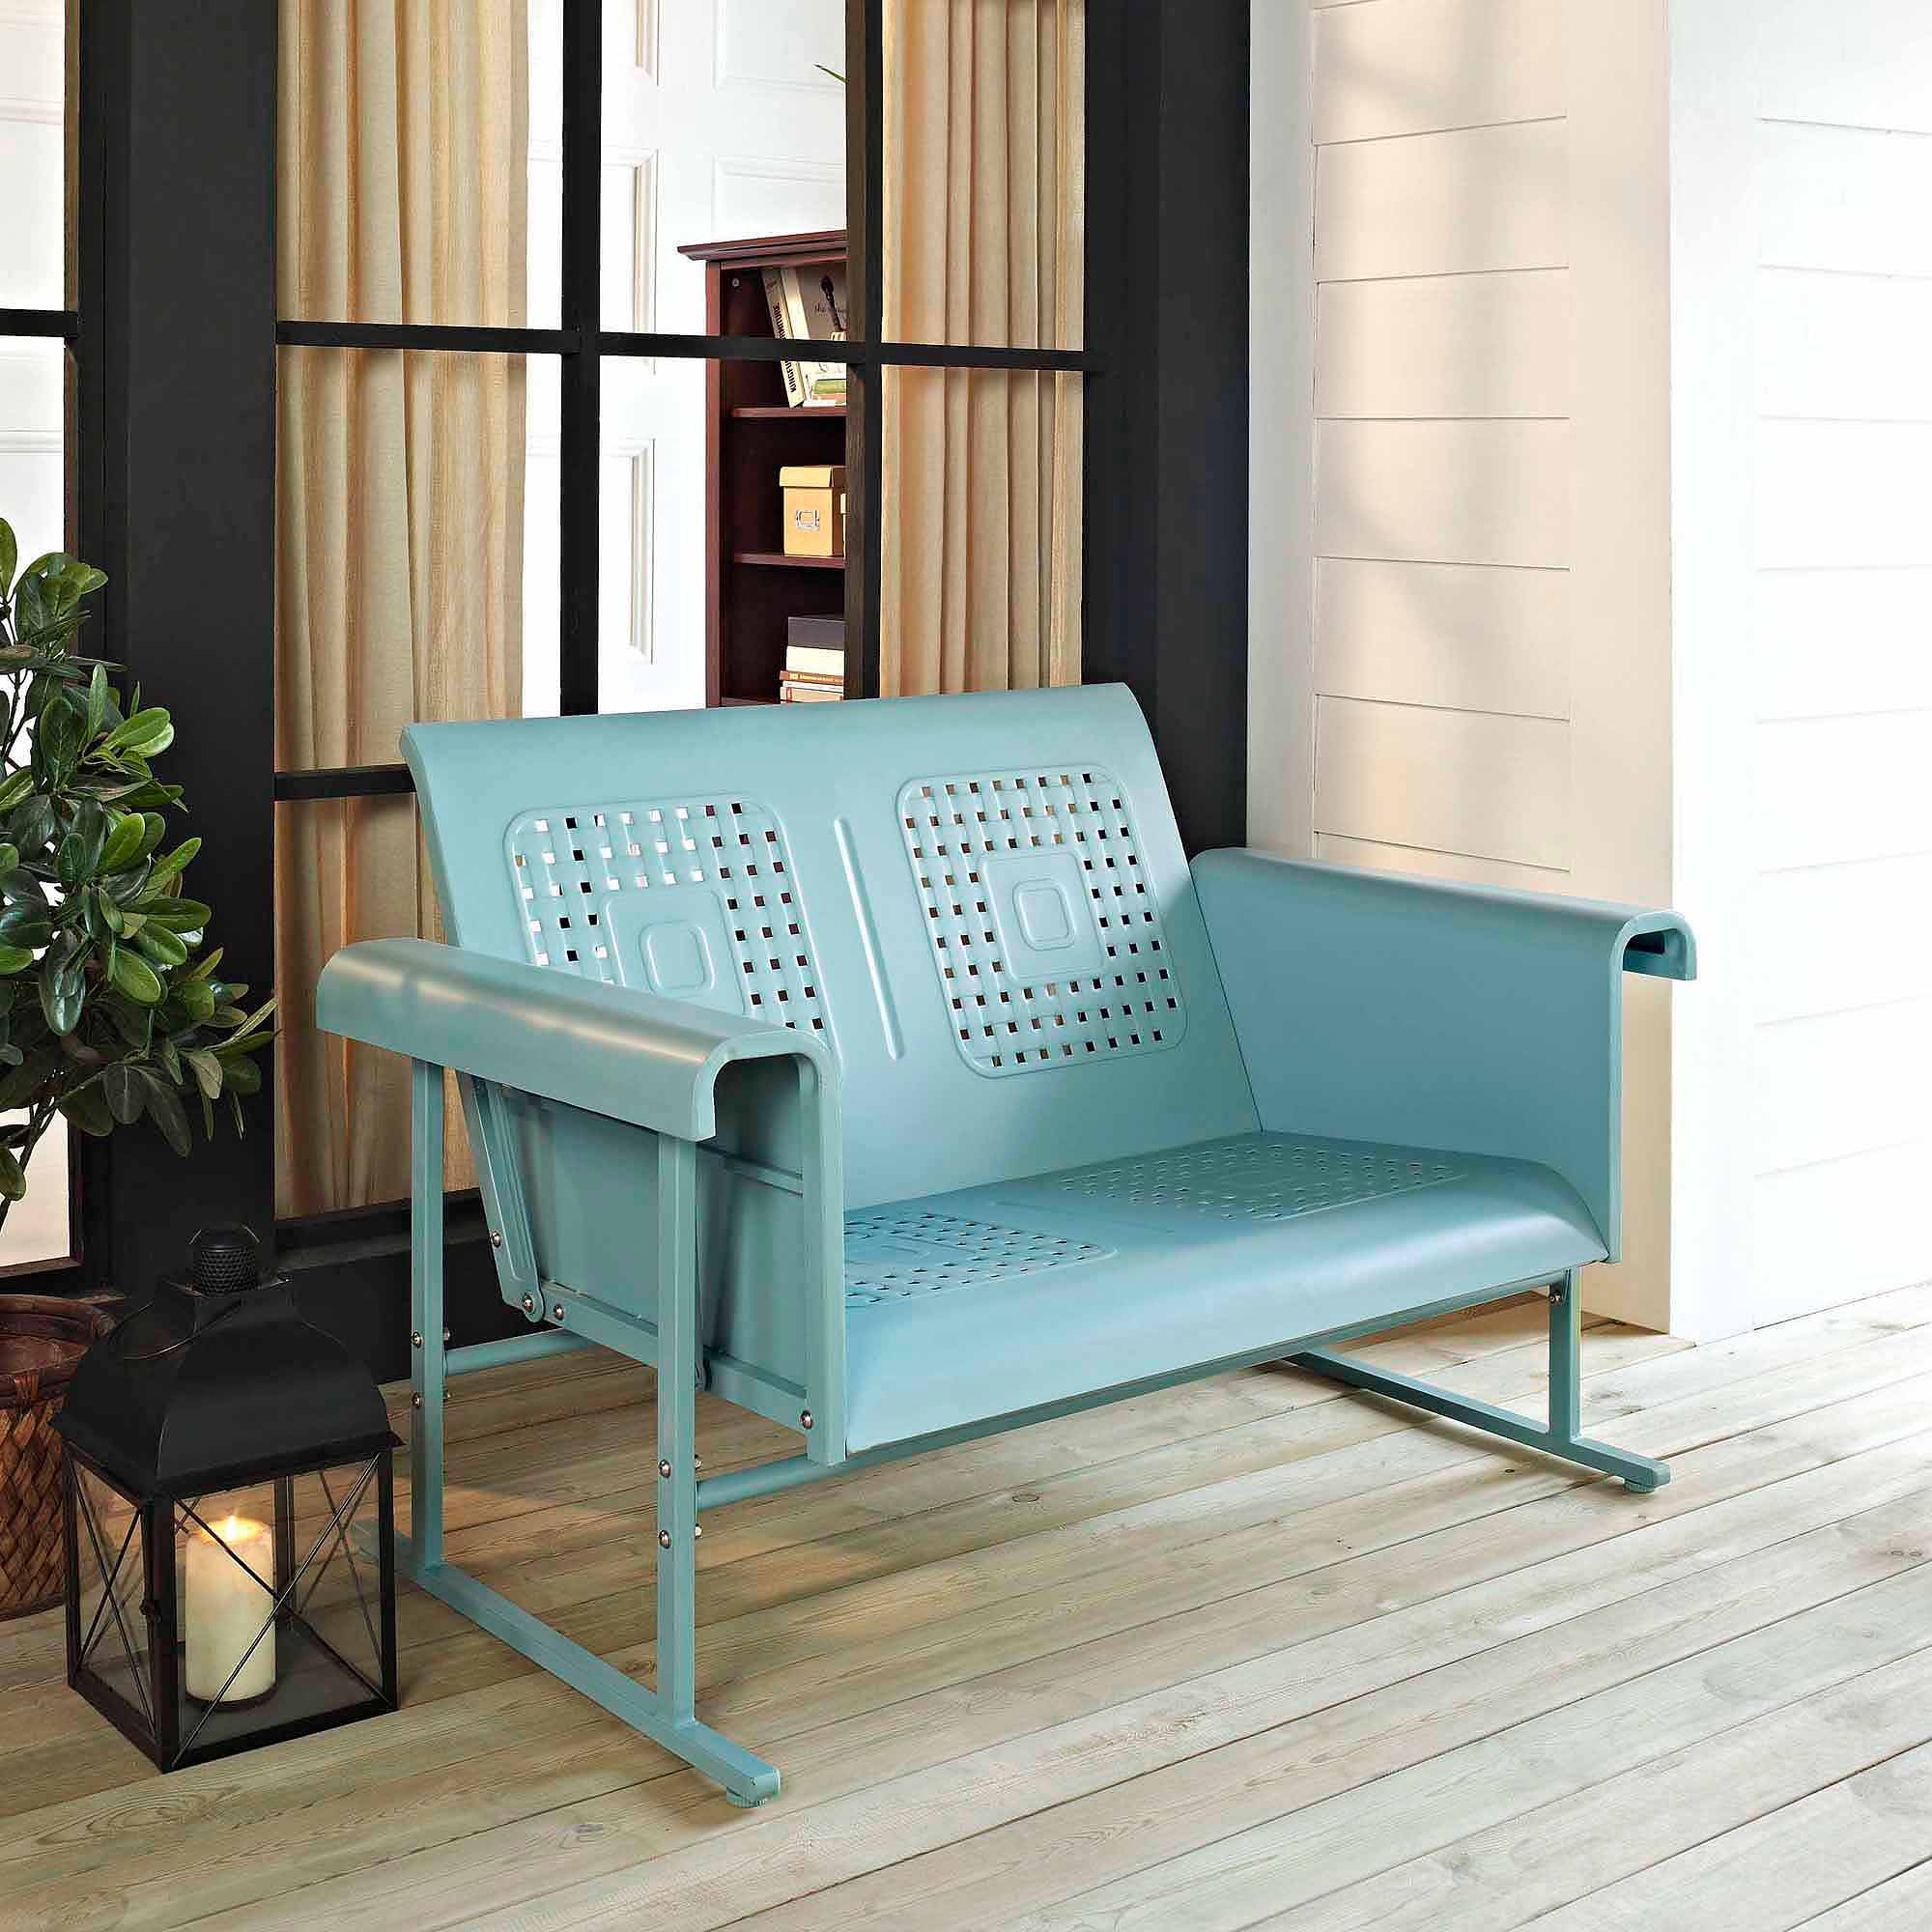 Crosley Furniture Veranda Loveseat Glider – Walmart Intended For Metal Retro Glider Benches (Image 2 of 25)